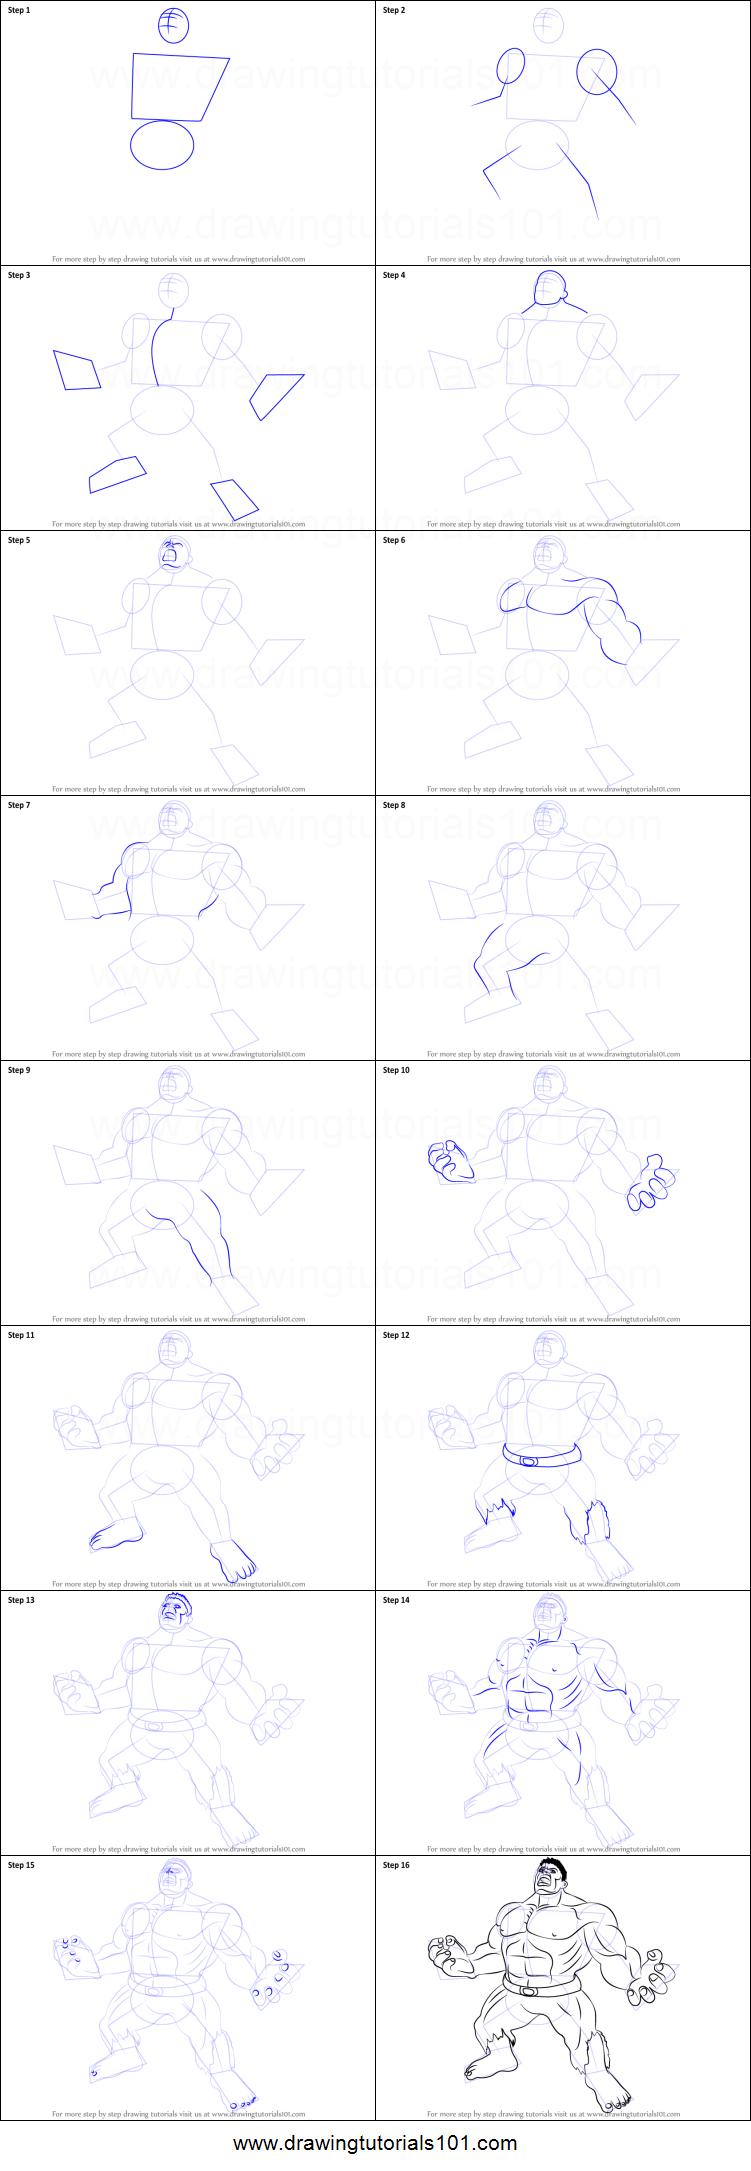 How to Draw Angry Hulk... Easy Superhero Drawing